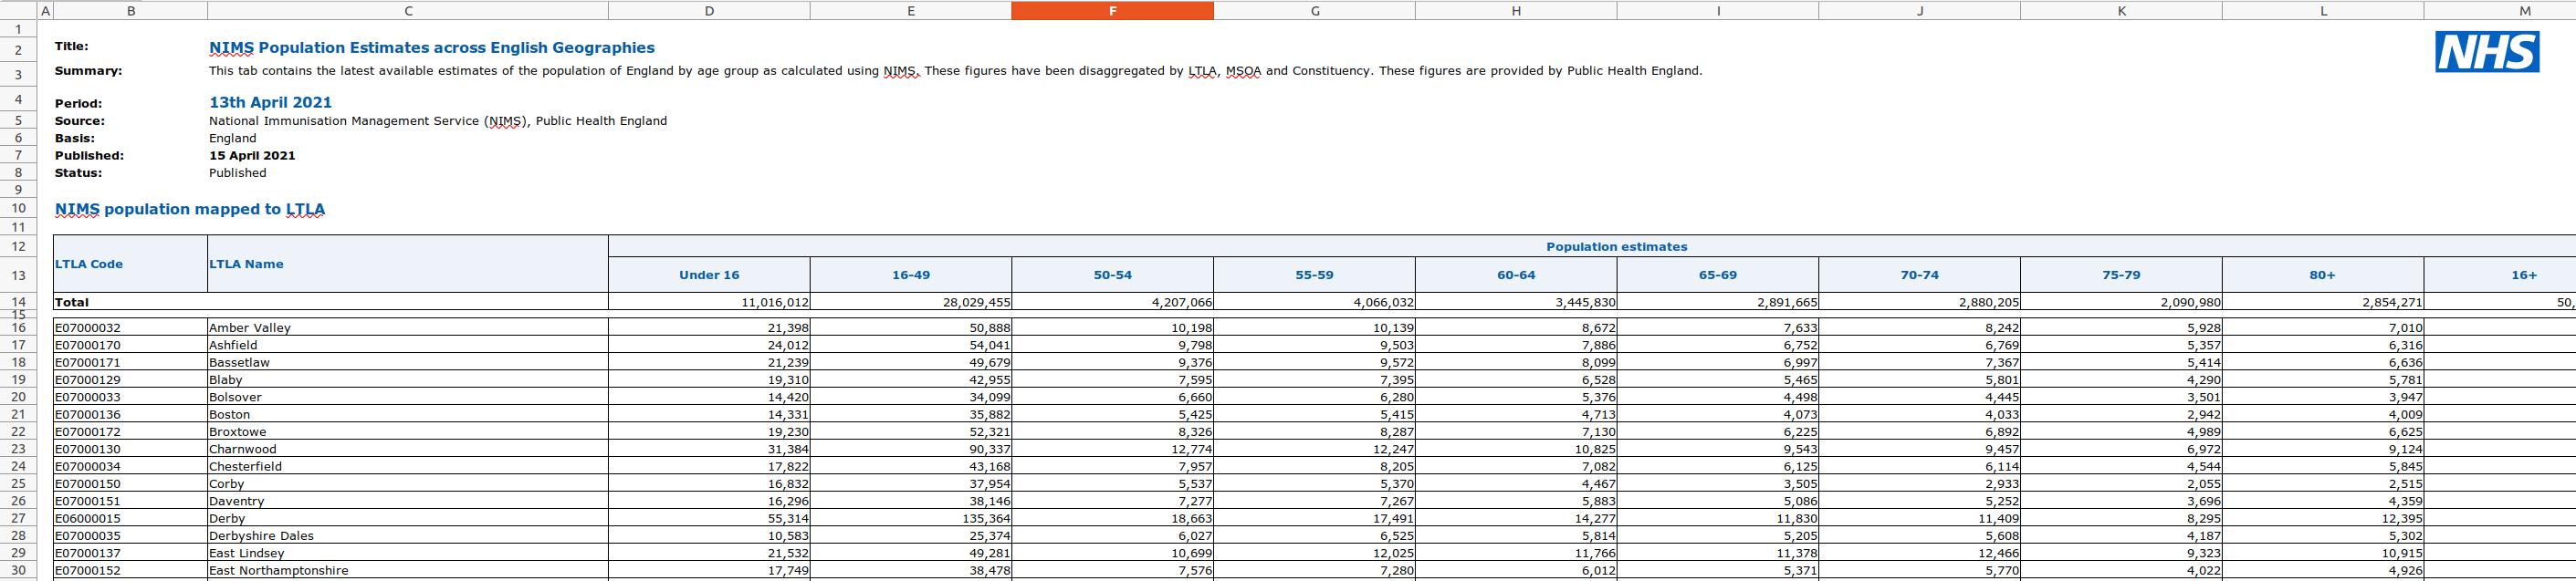 ltla spreadsheet population